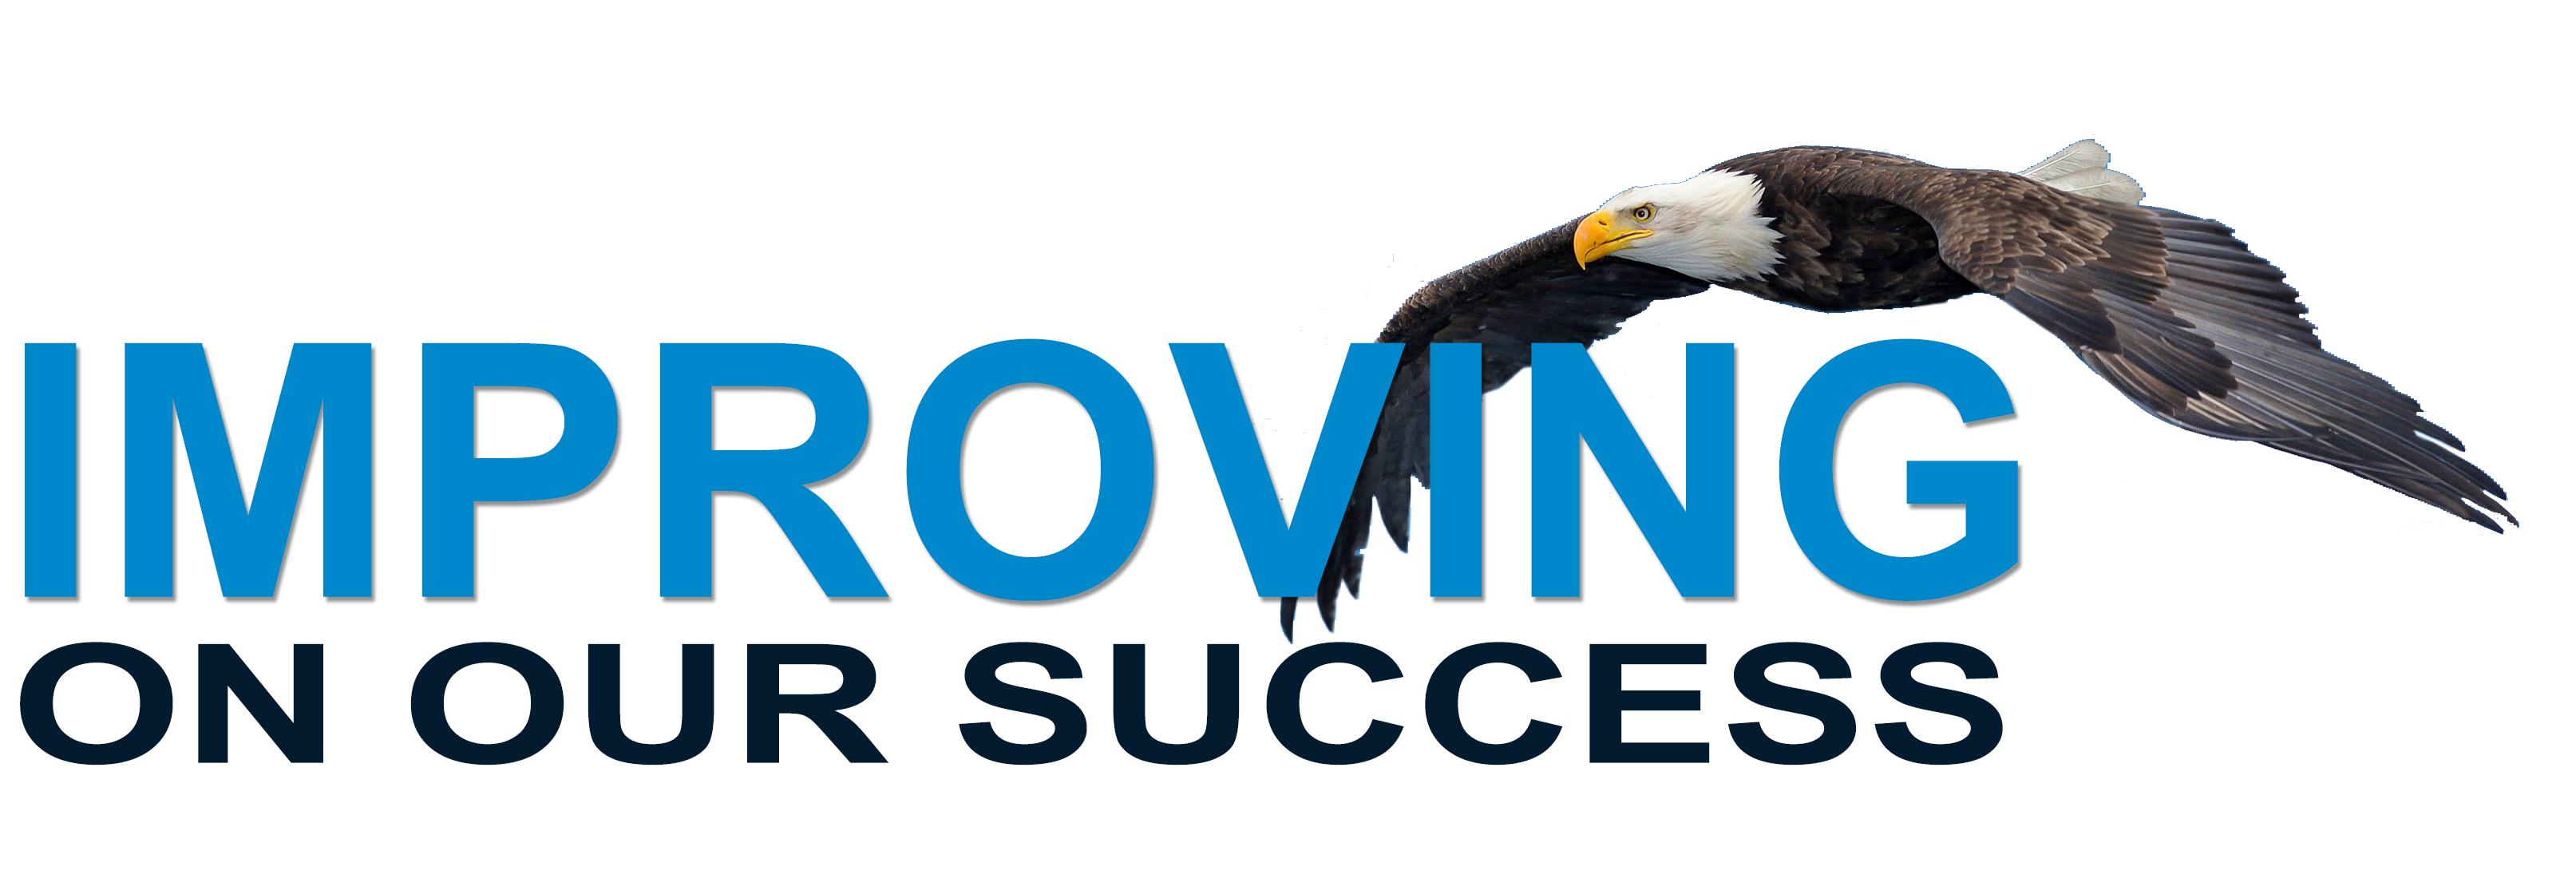 improving eagle